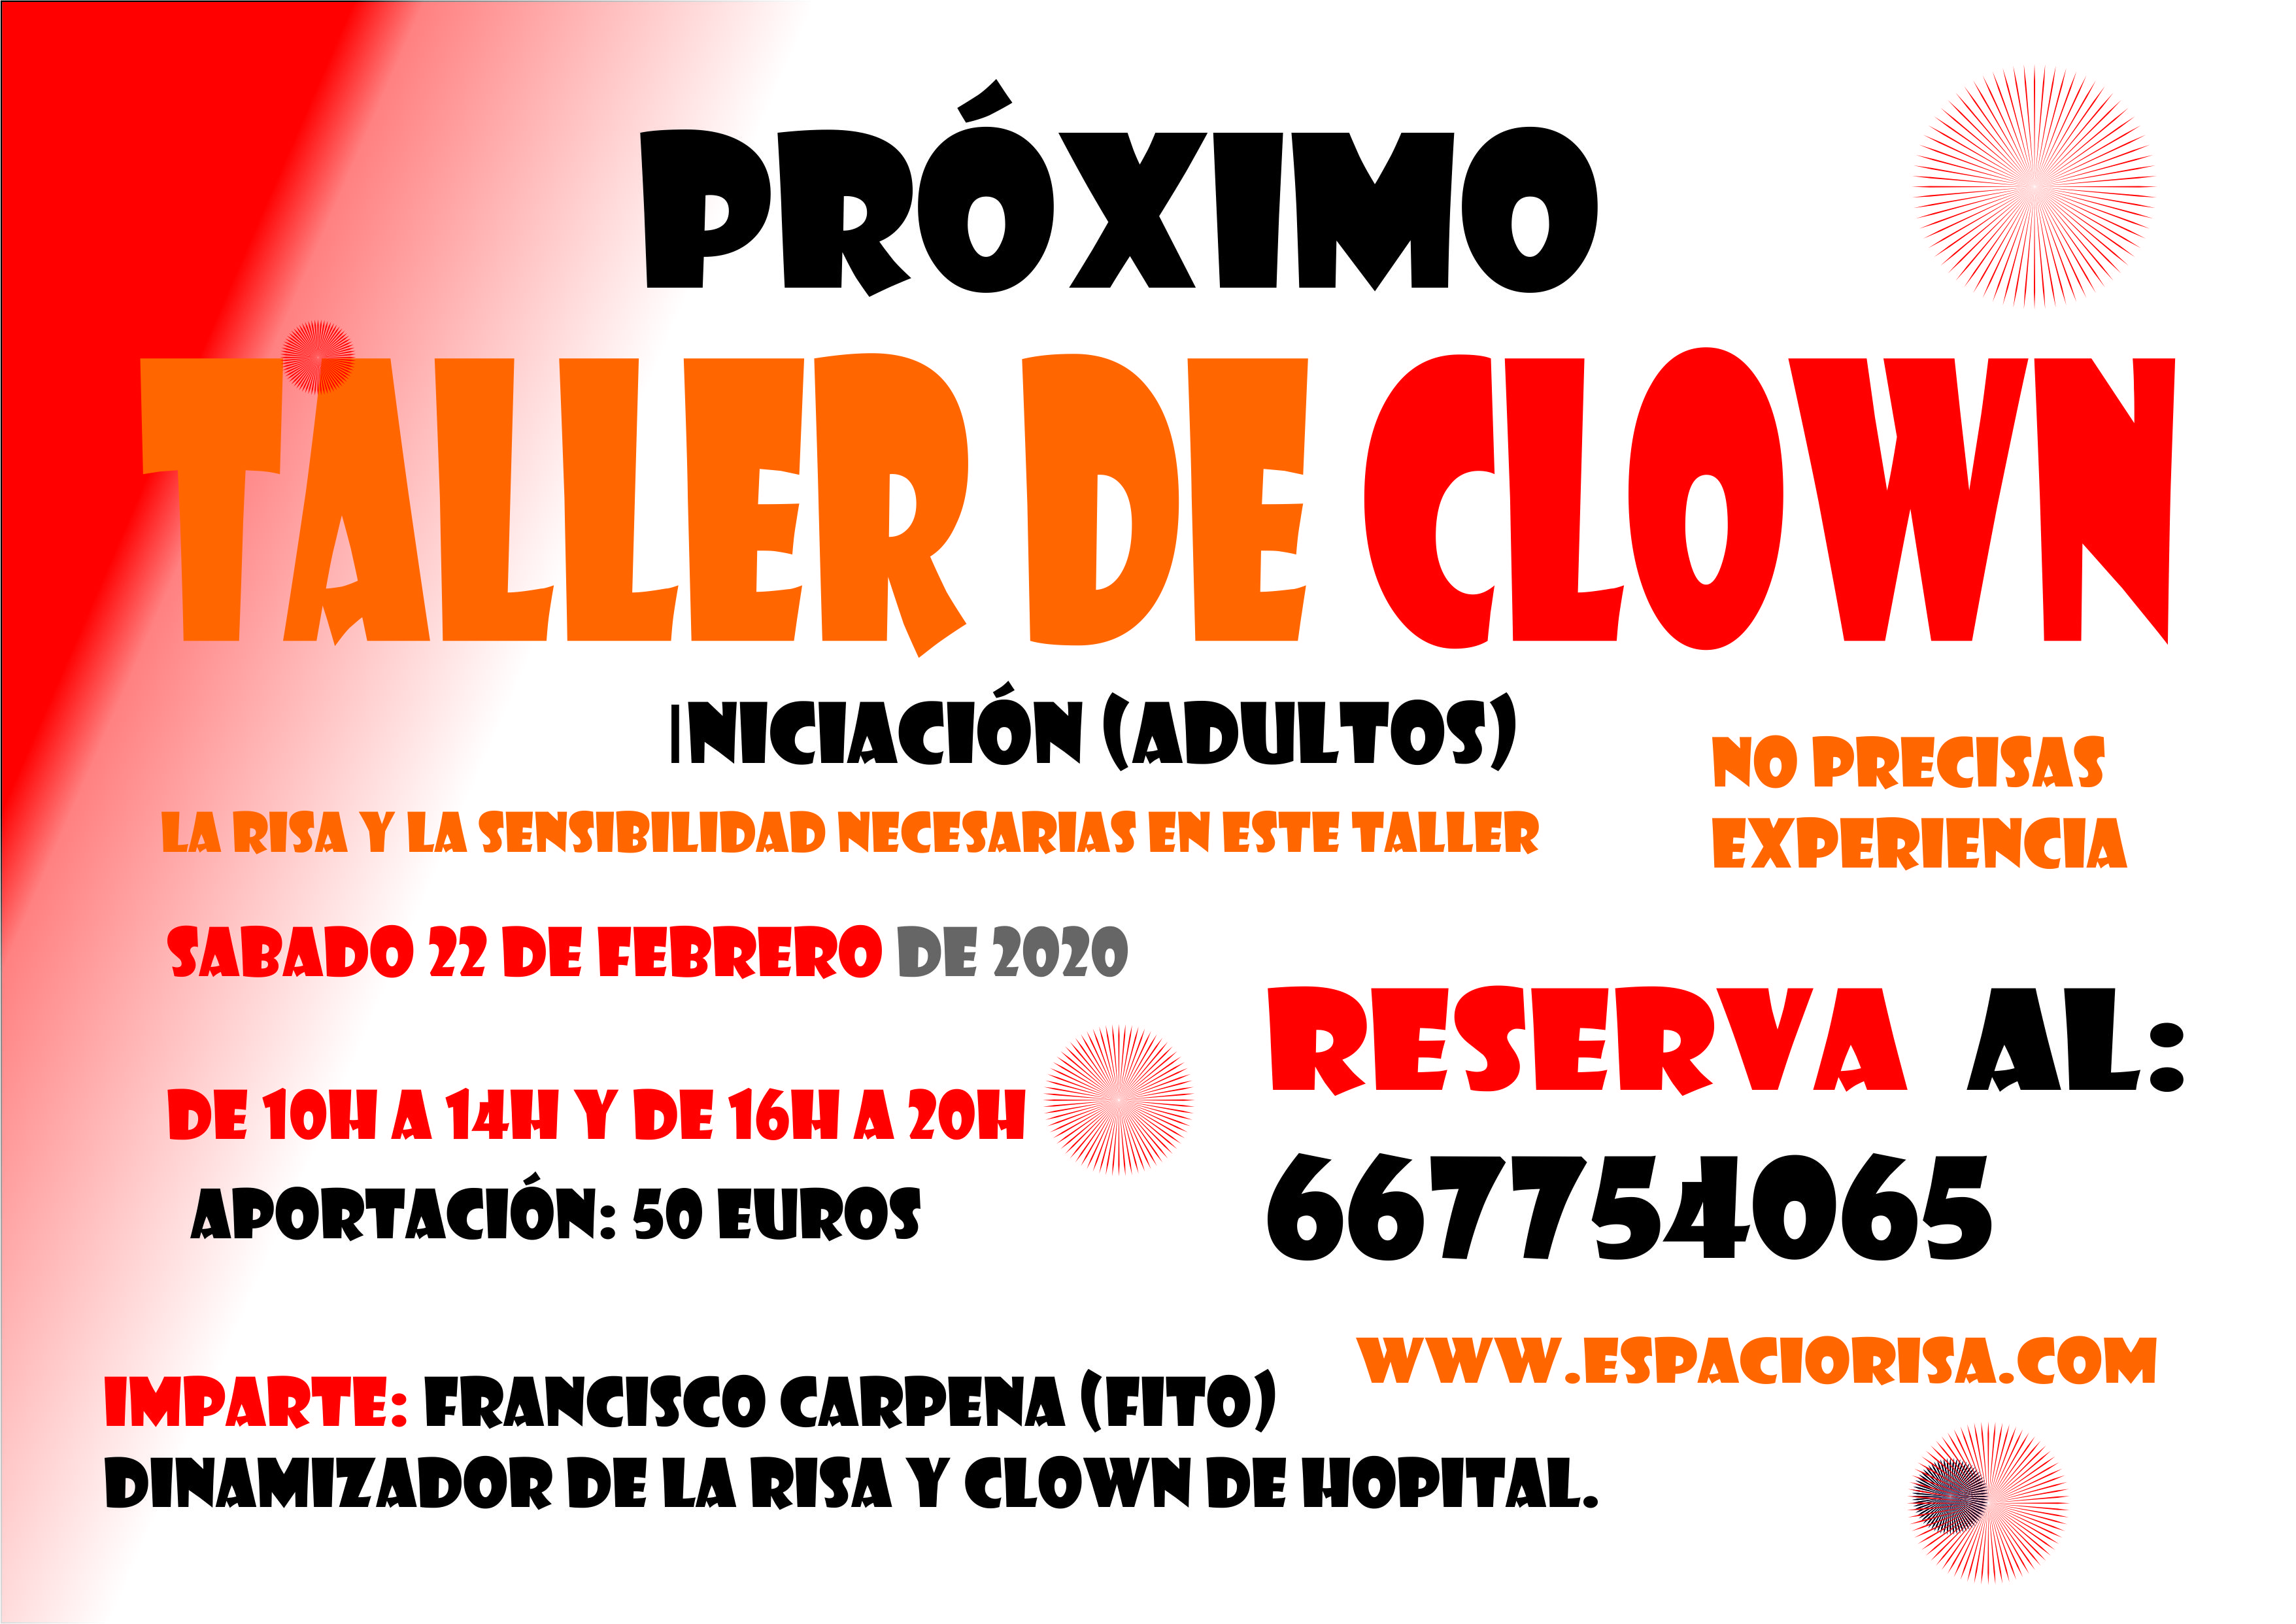 Próximo Taller de clown para gente normal, pero auténtica (INICIACIÓN) 22 de Febrero sábado.